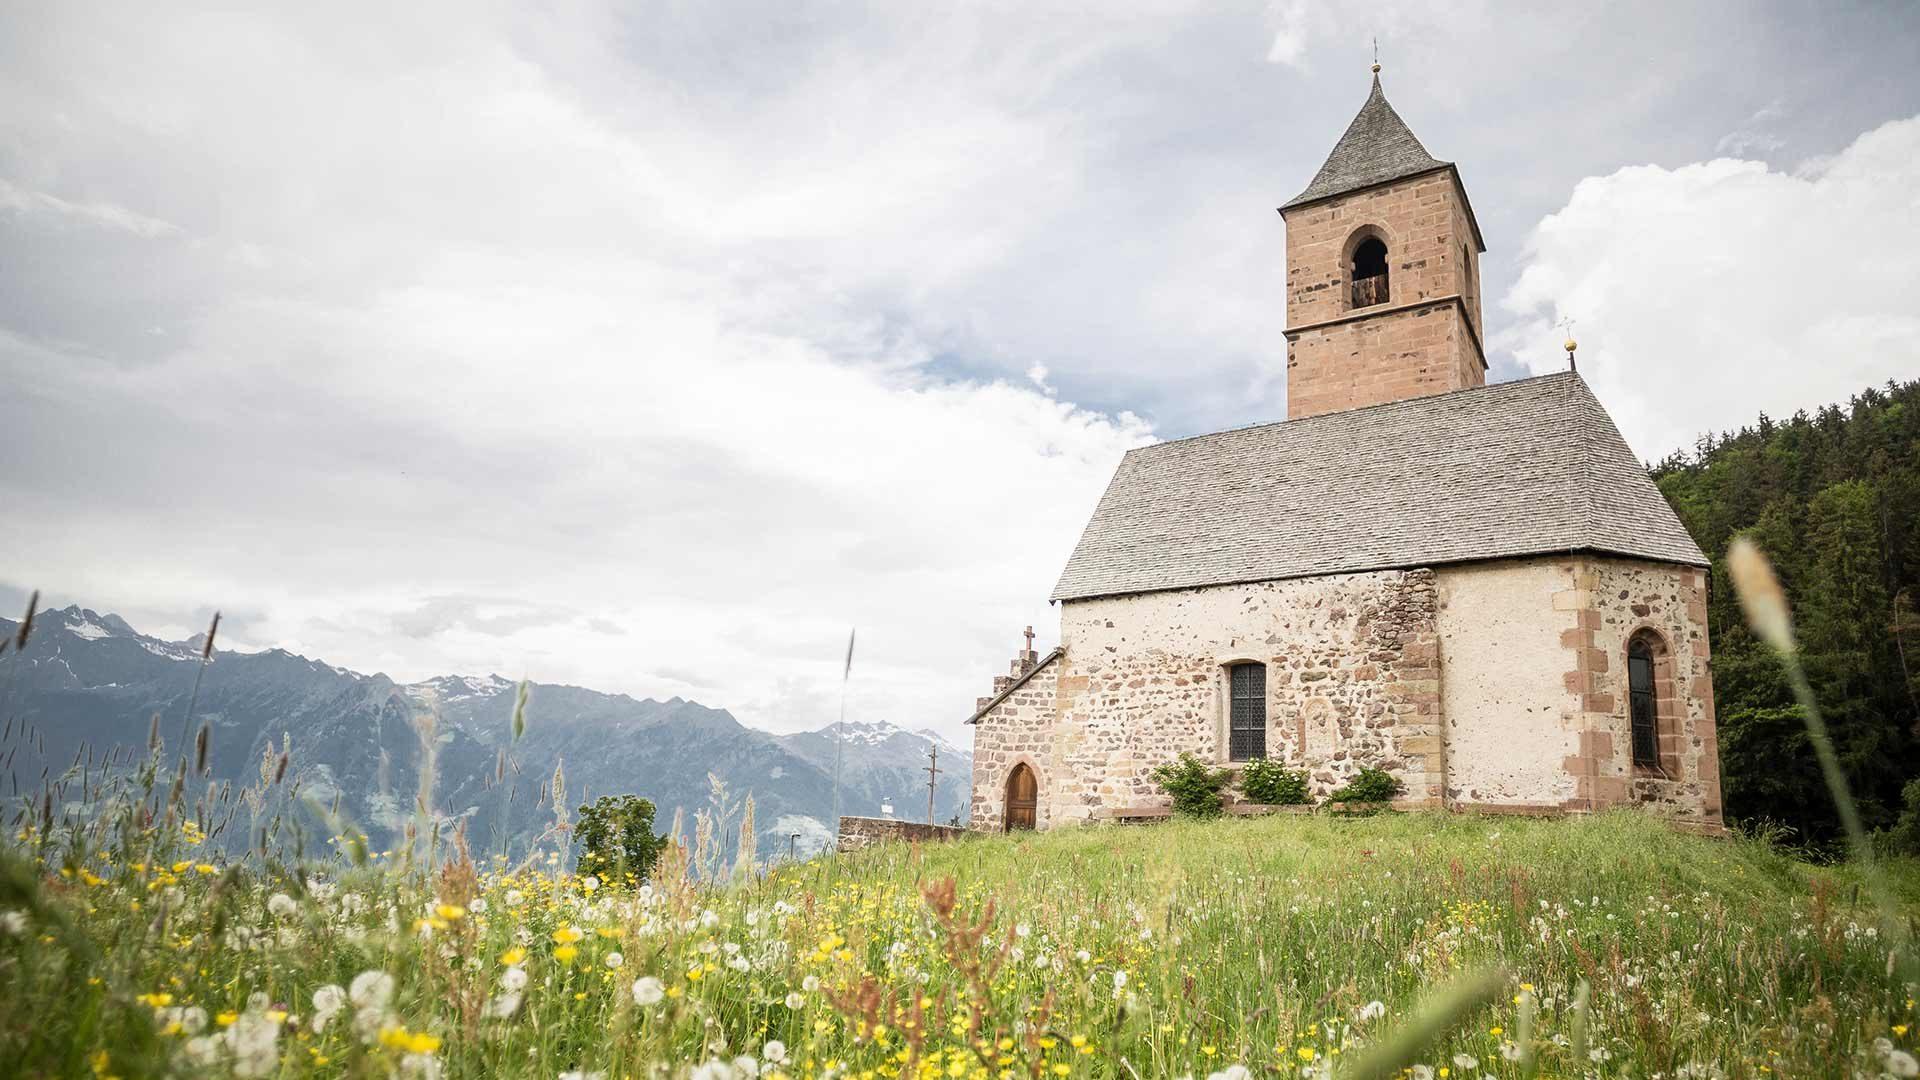 Chiesetta di Santa Caterina ad Avelengo